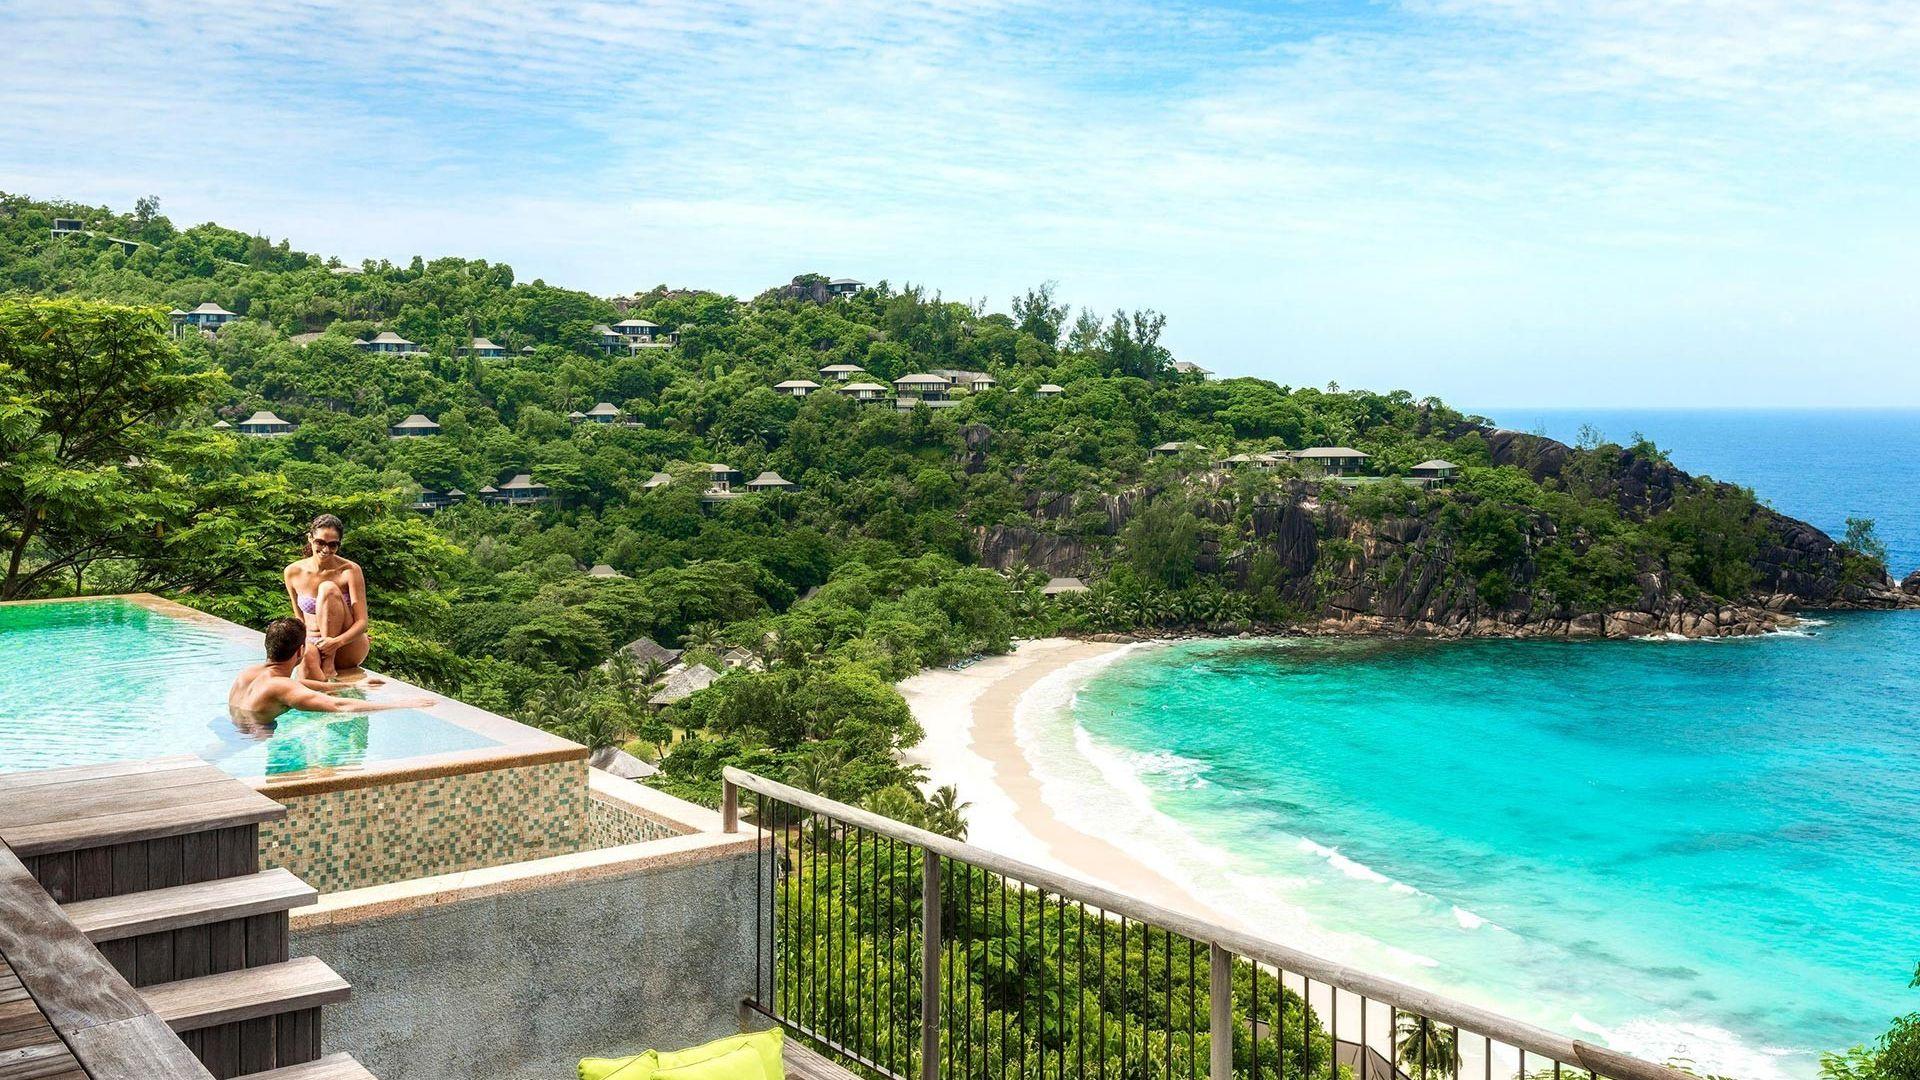 Luxury Seychelles - Four Seasons, Insula Mahe - 9 zile, zbor charter business class